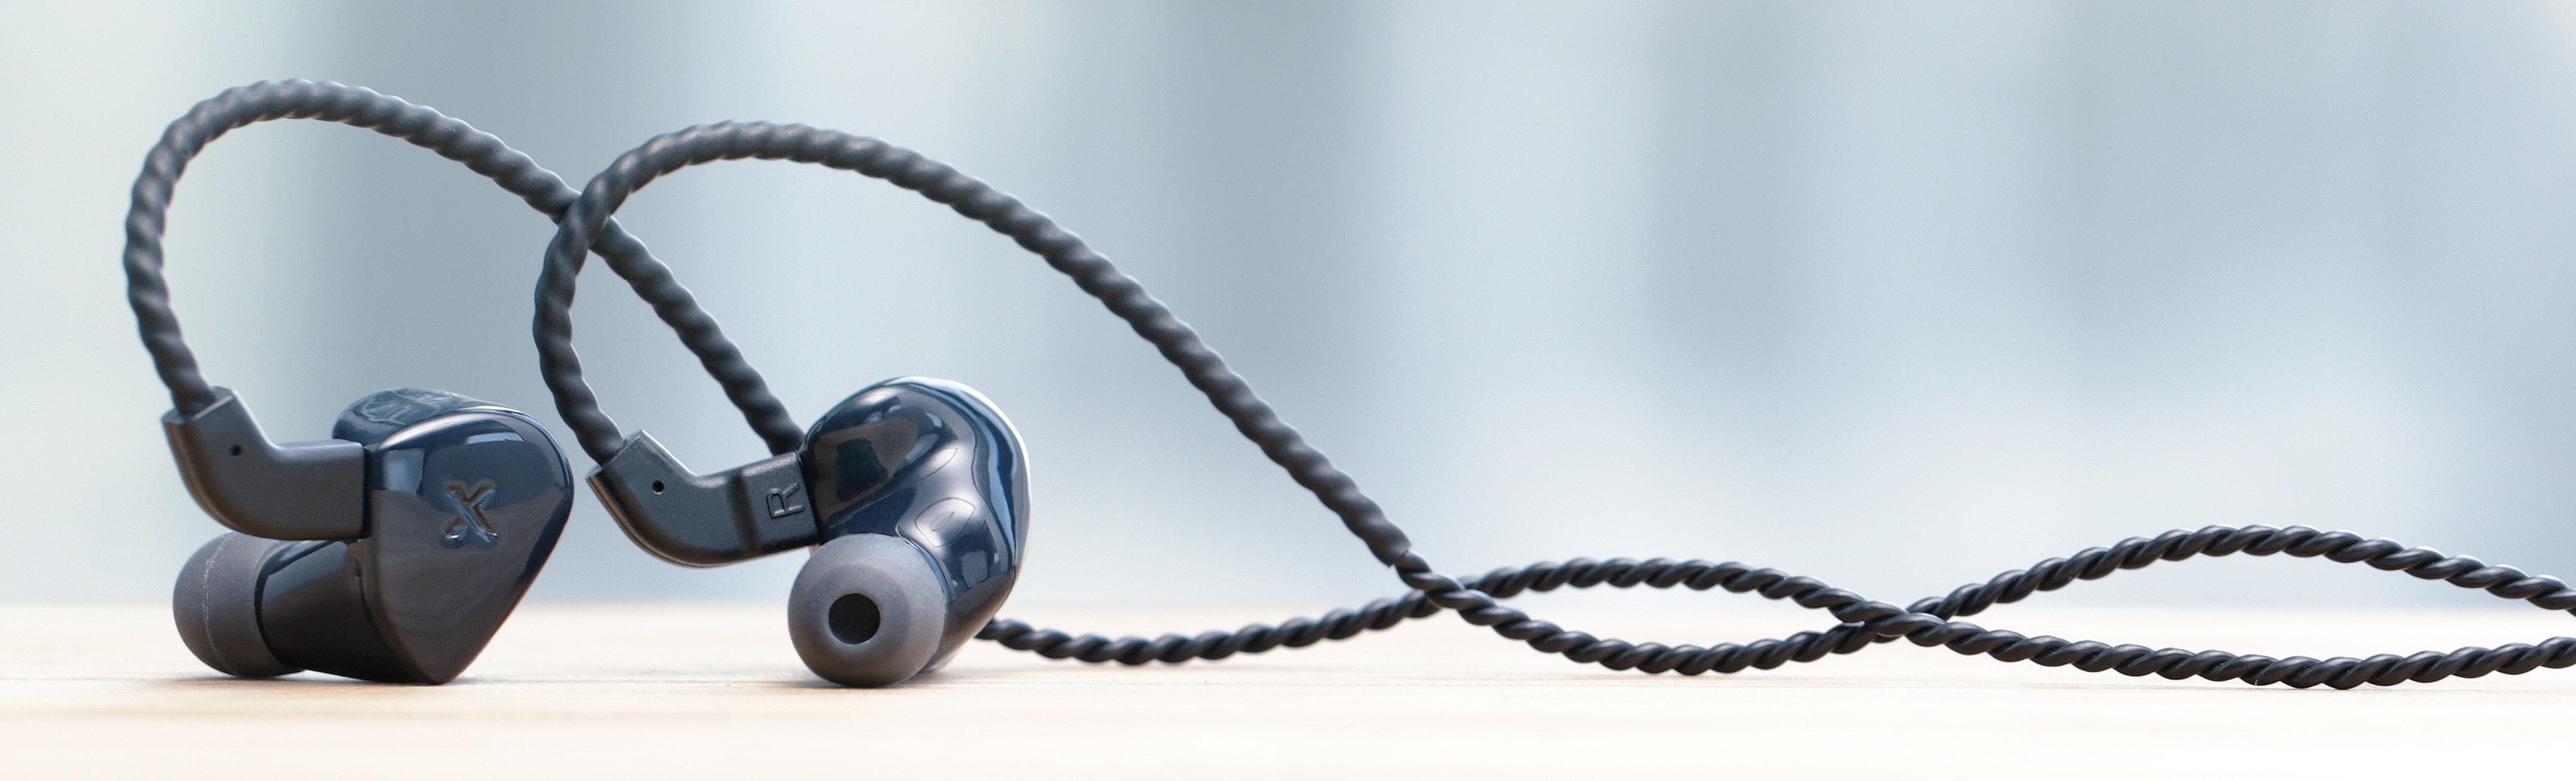 Massdrop x MEE audio Planamic In-Ear Monitors